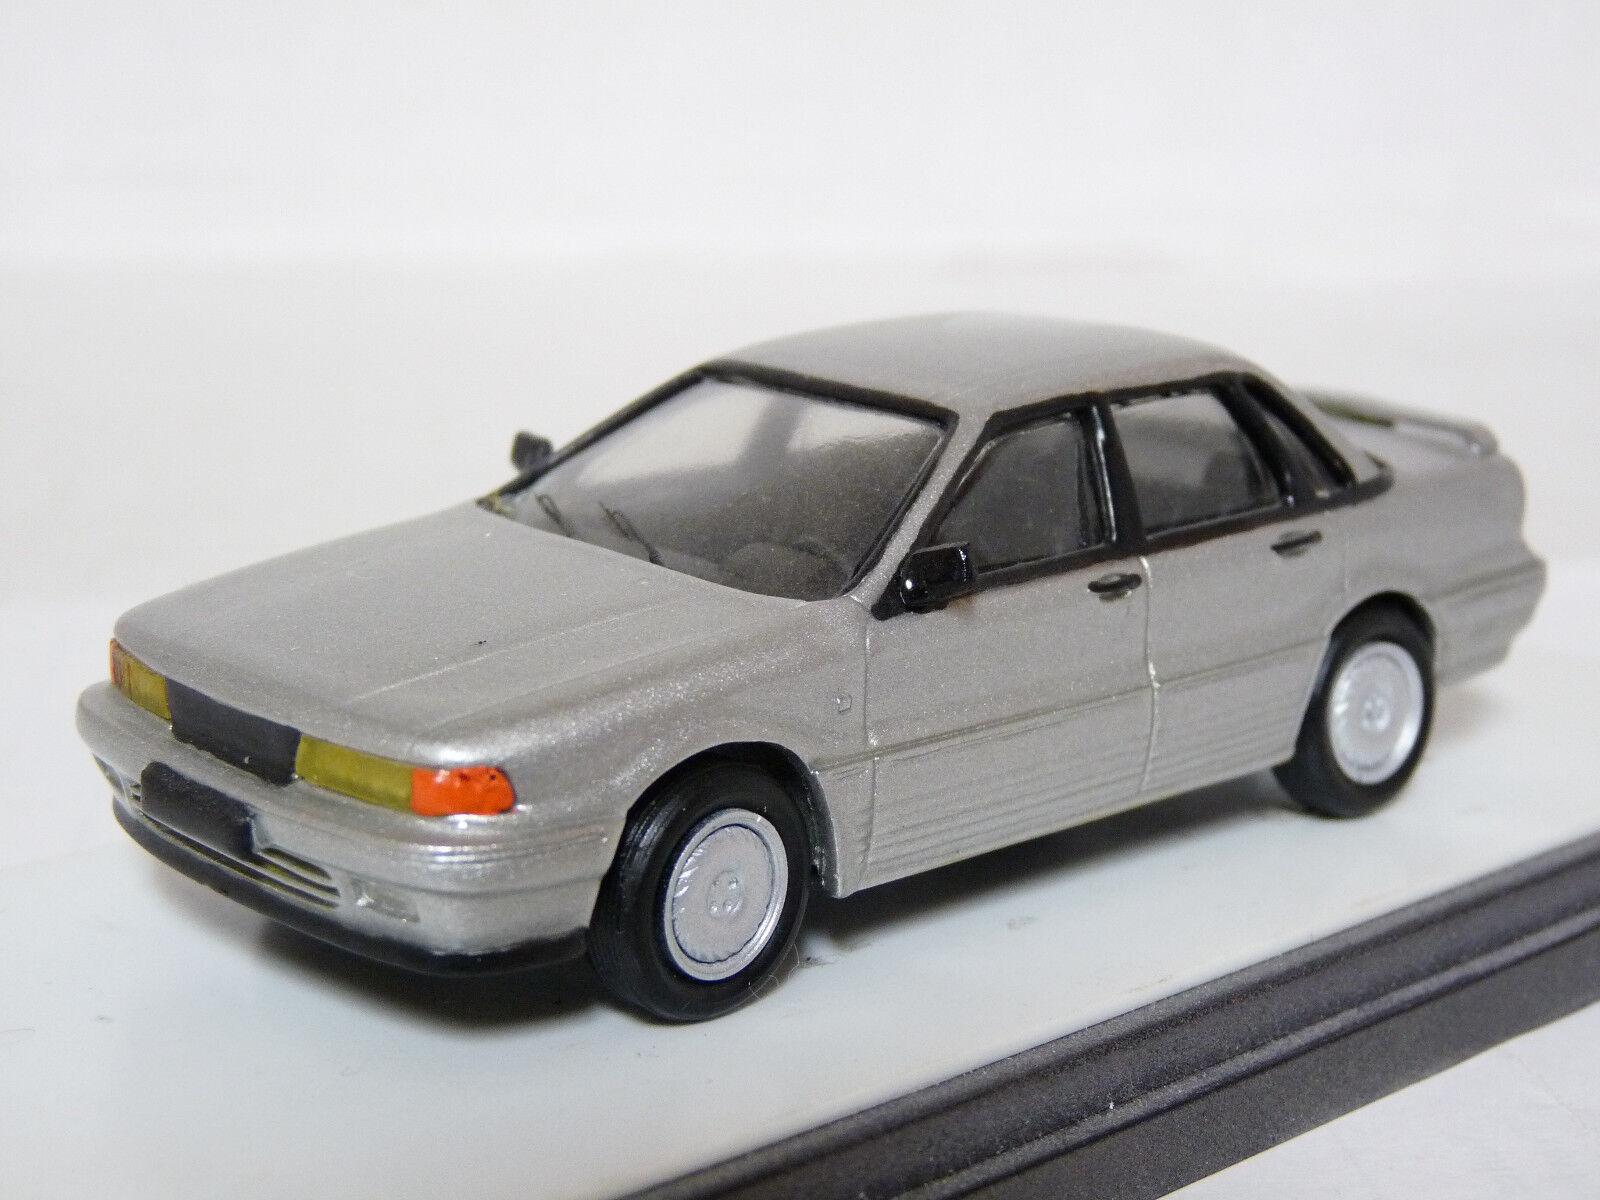 Jemmpy 161 1 43 1989 Mitsubishi Galant Gti 16V Kit de Coche Modelo de Resina Hecho a Mano